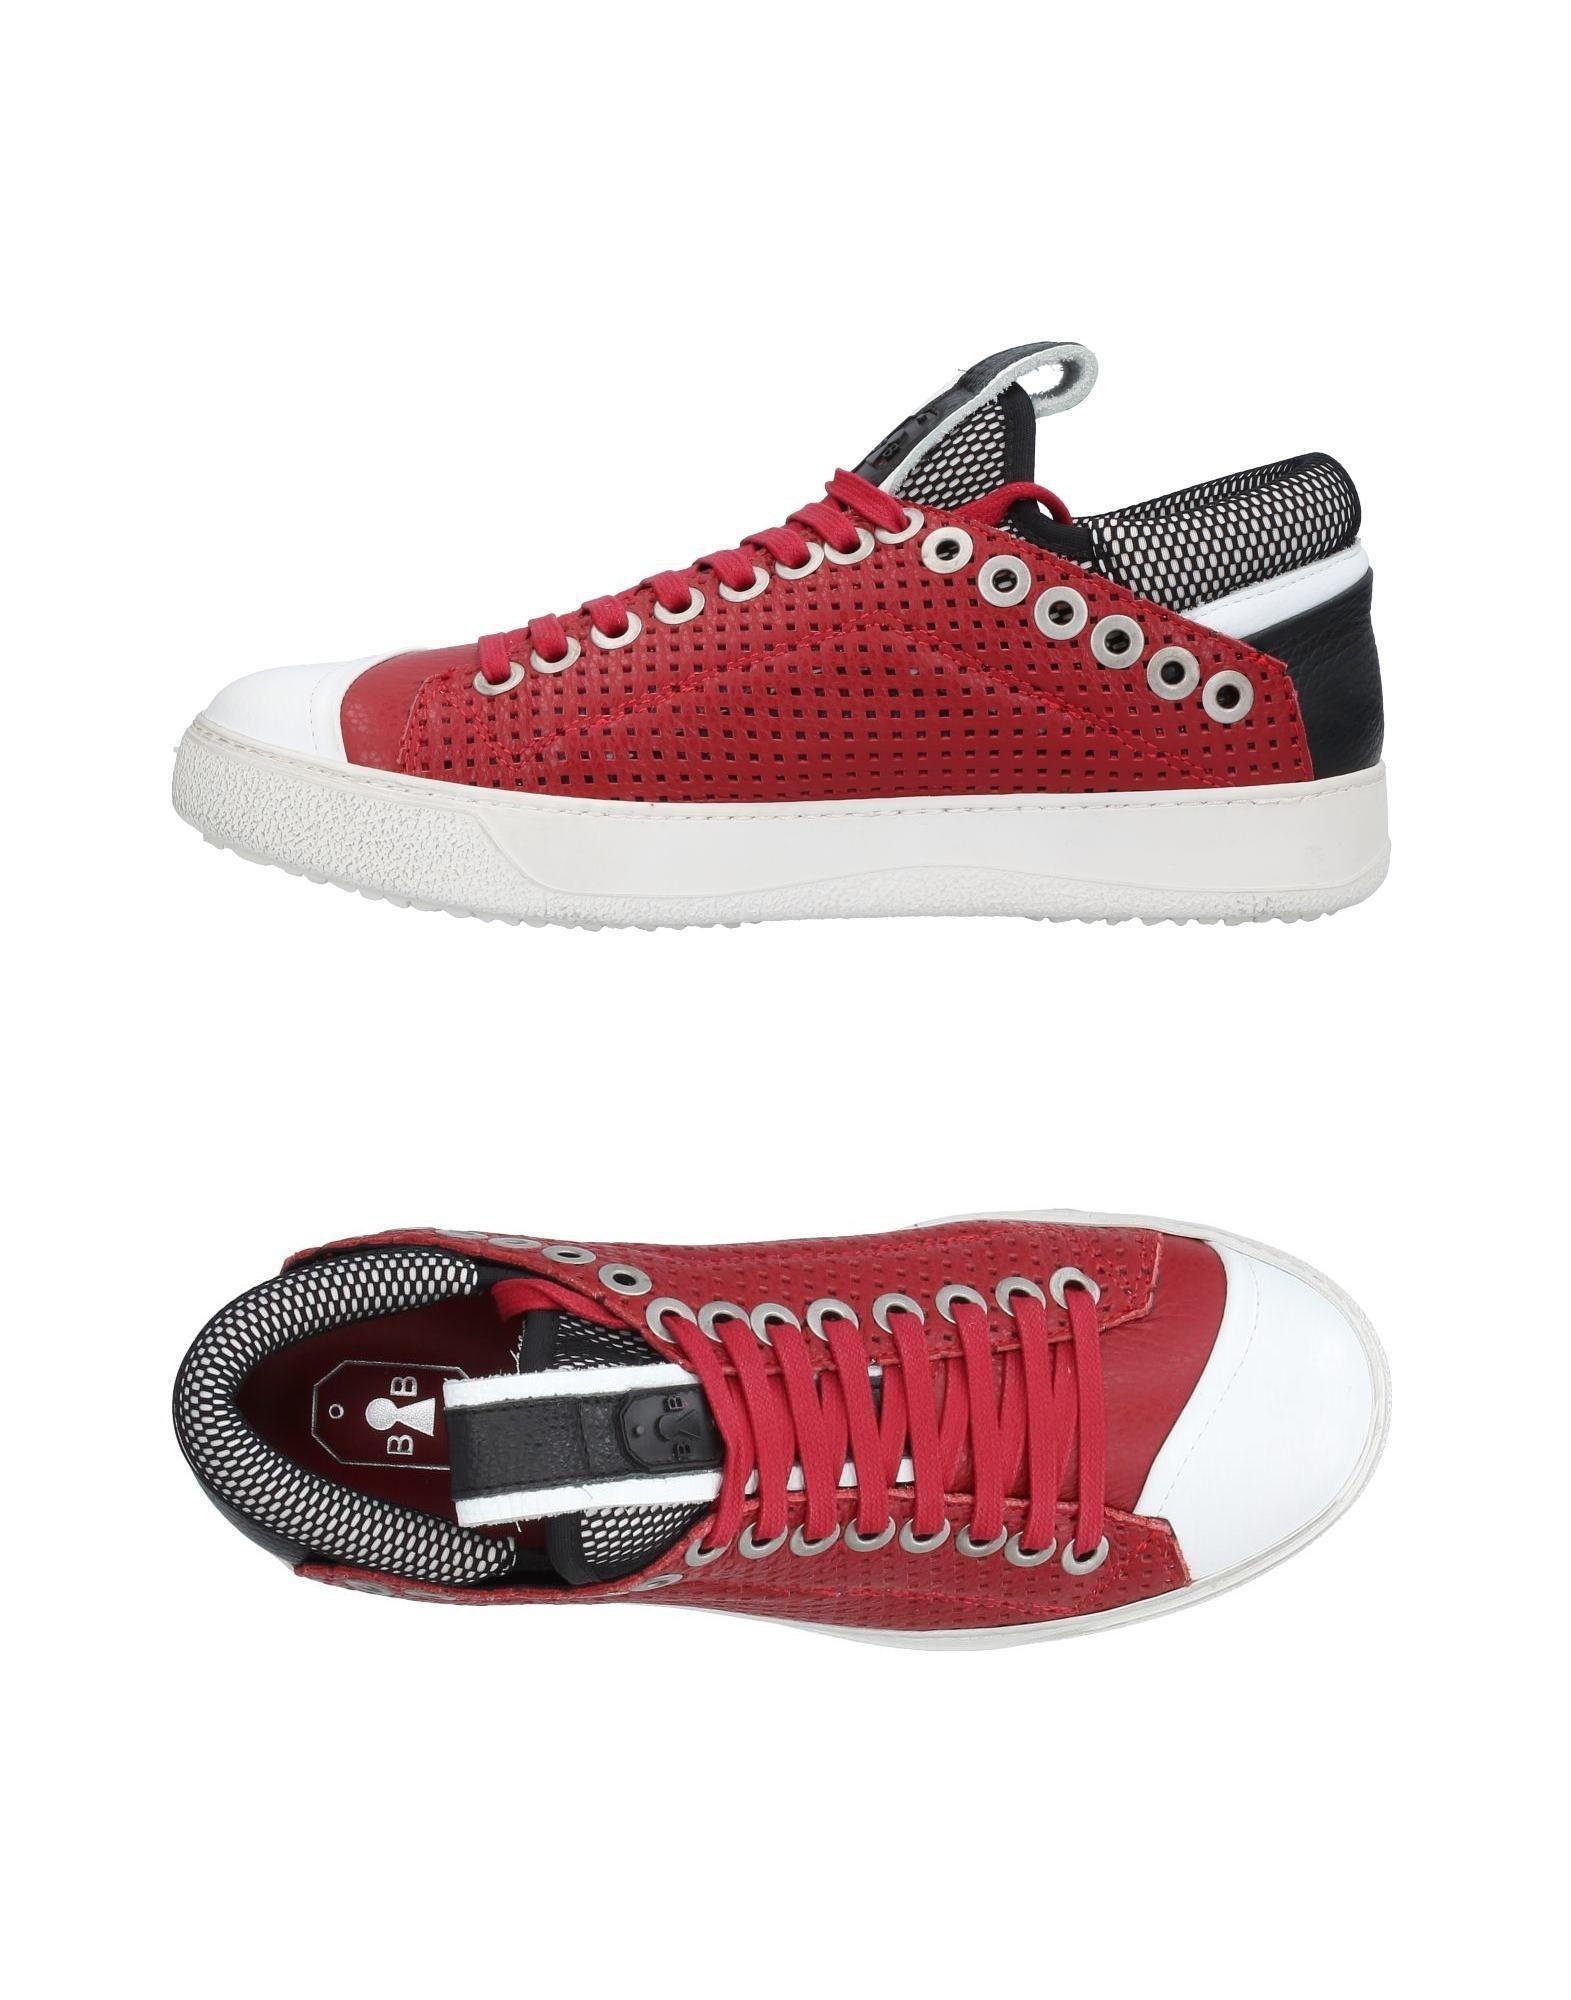 FOOTWEAR - Low-tops & sneakers Bruno Bordese ijHrgOz